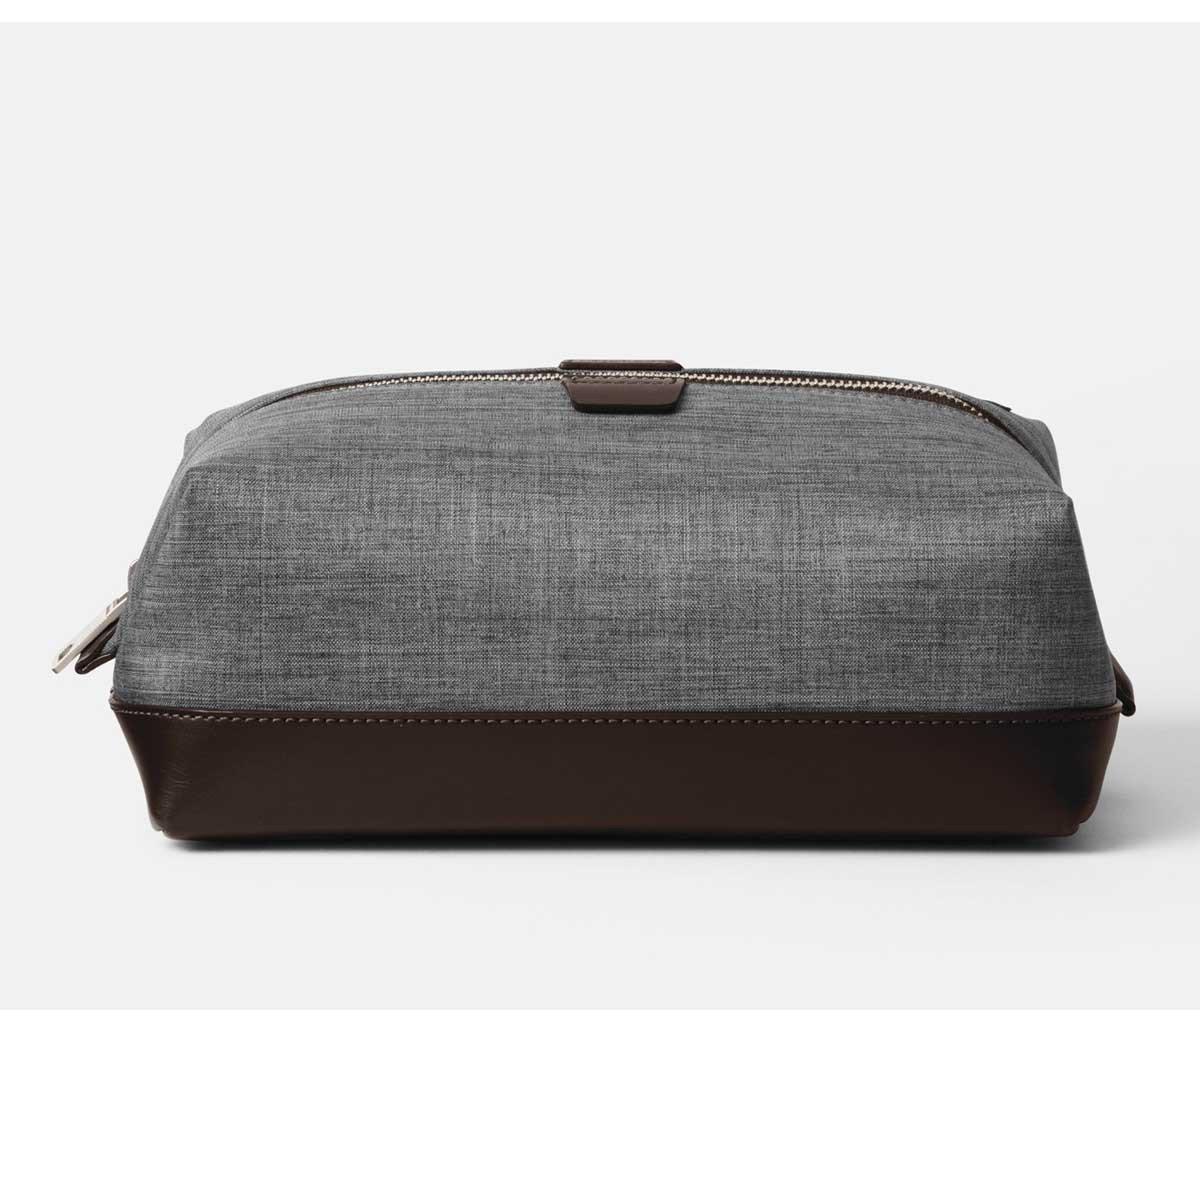 Jack Spade Men's Grey/Black Tech Oxford Travel Kit